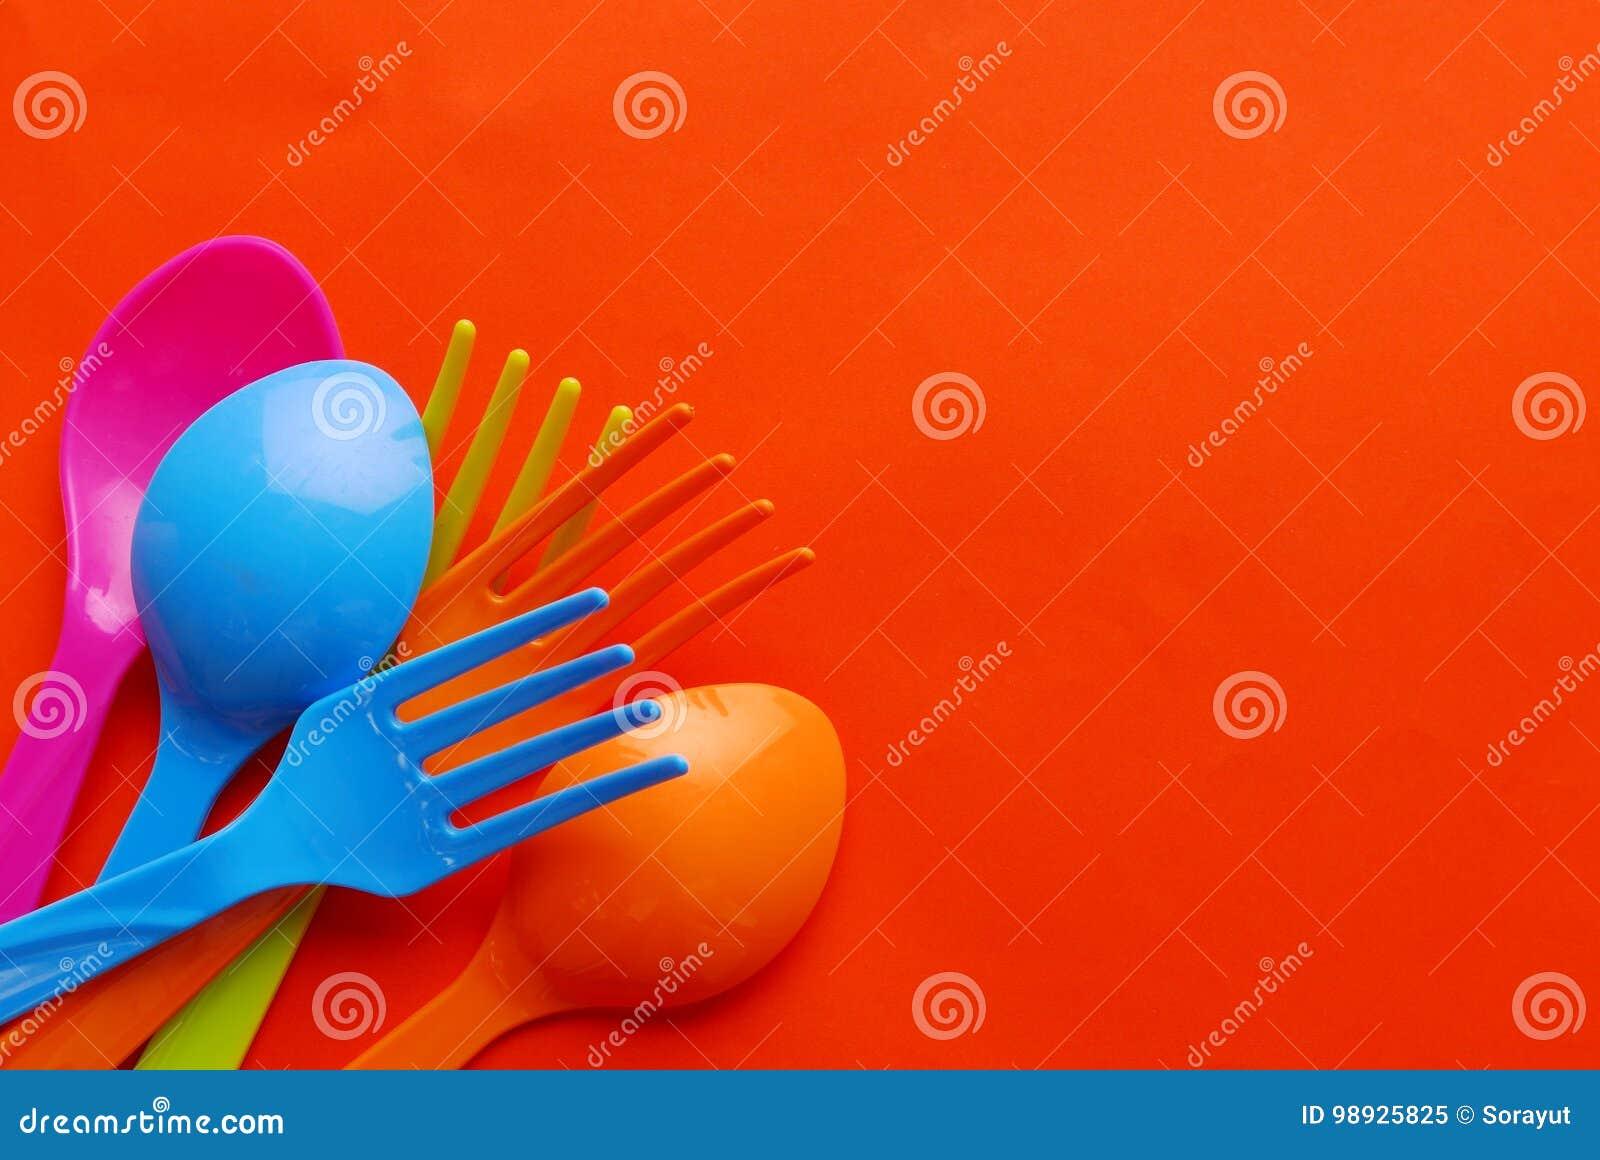 Colorful plastic spoon